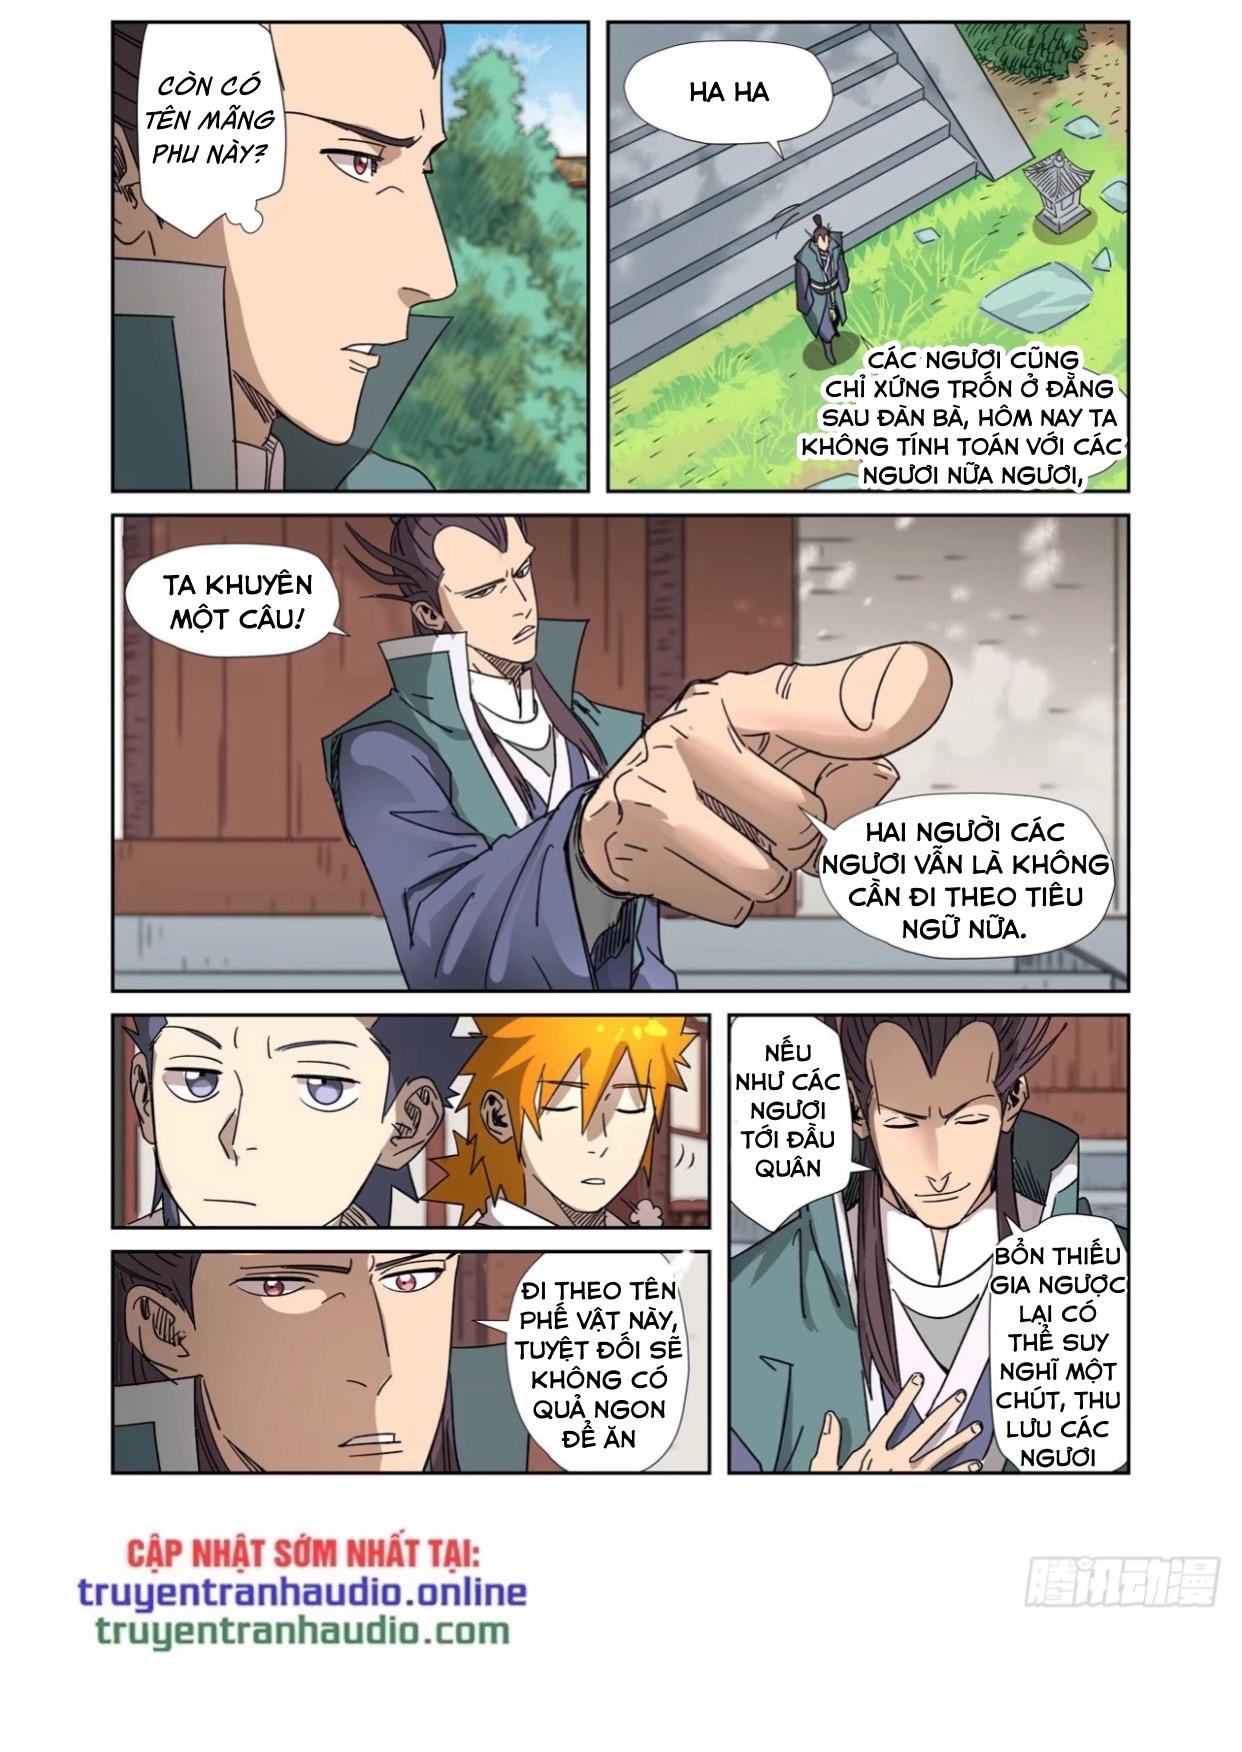 Yêu Thần Ký chap 302.5 - Trang 4